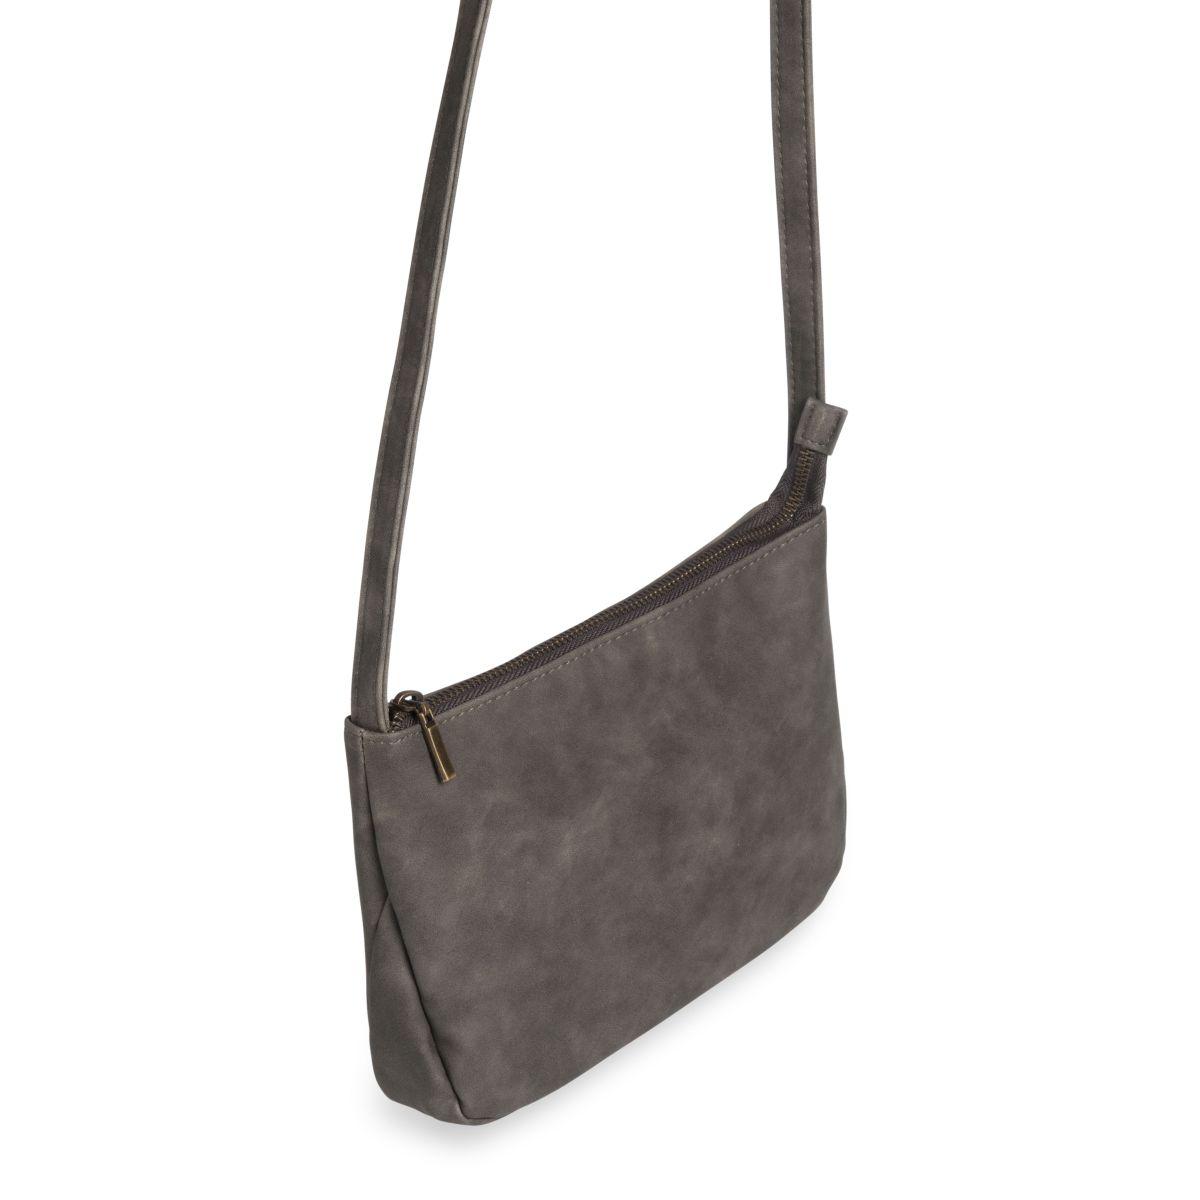 sofia shoulder bag khaki